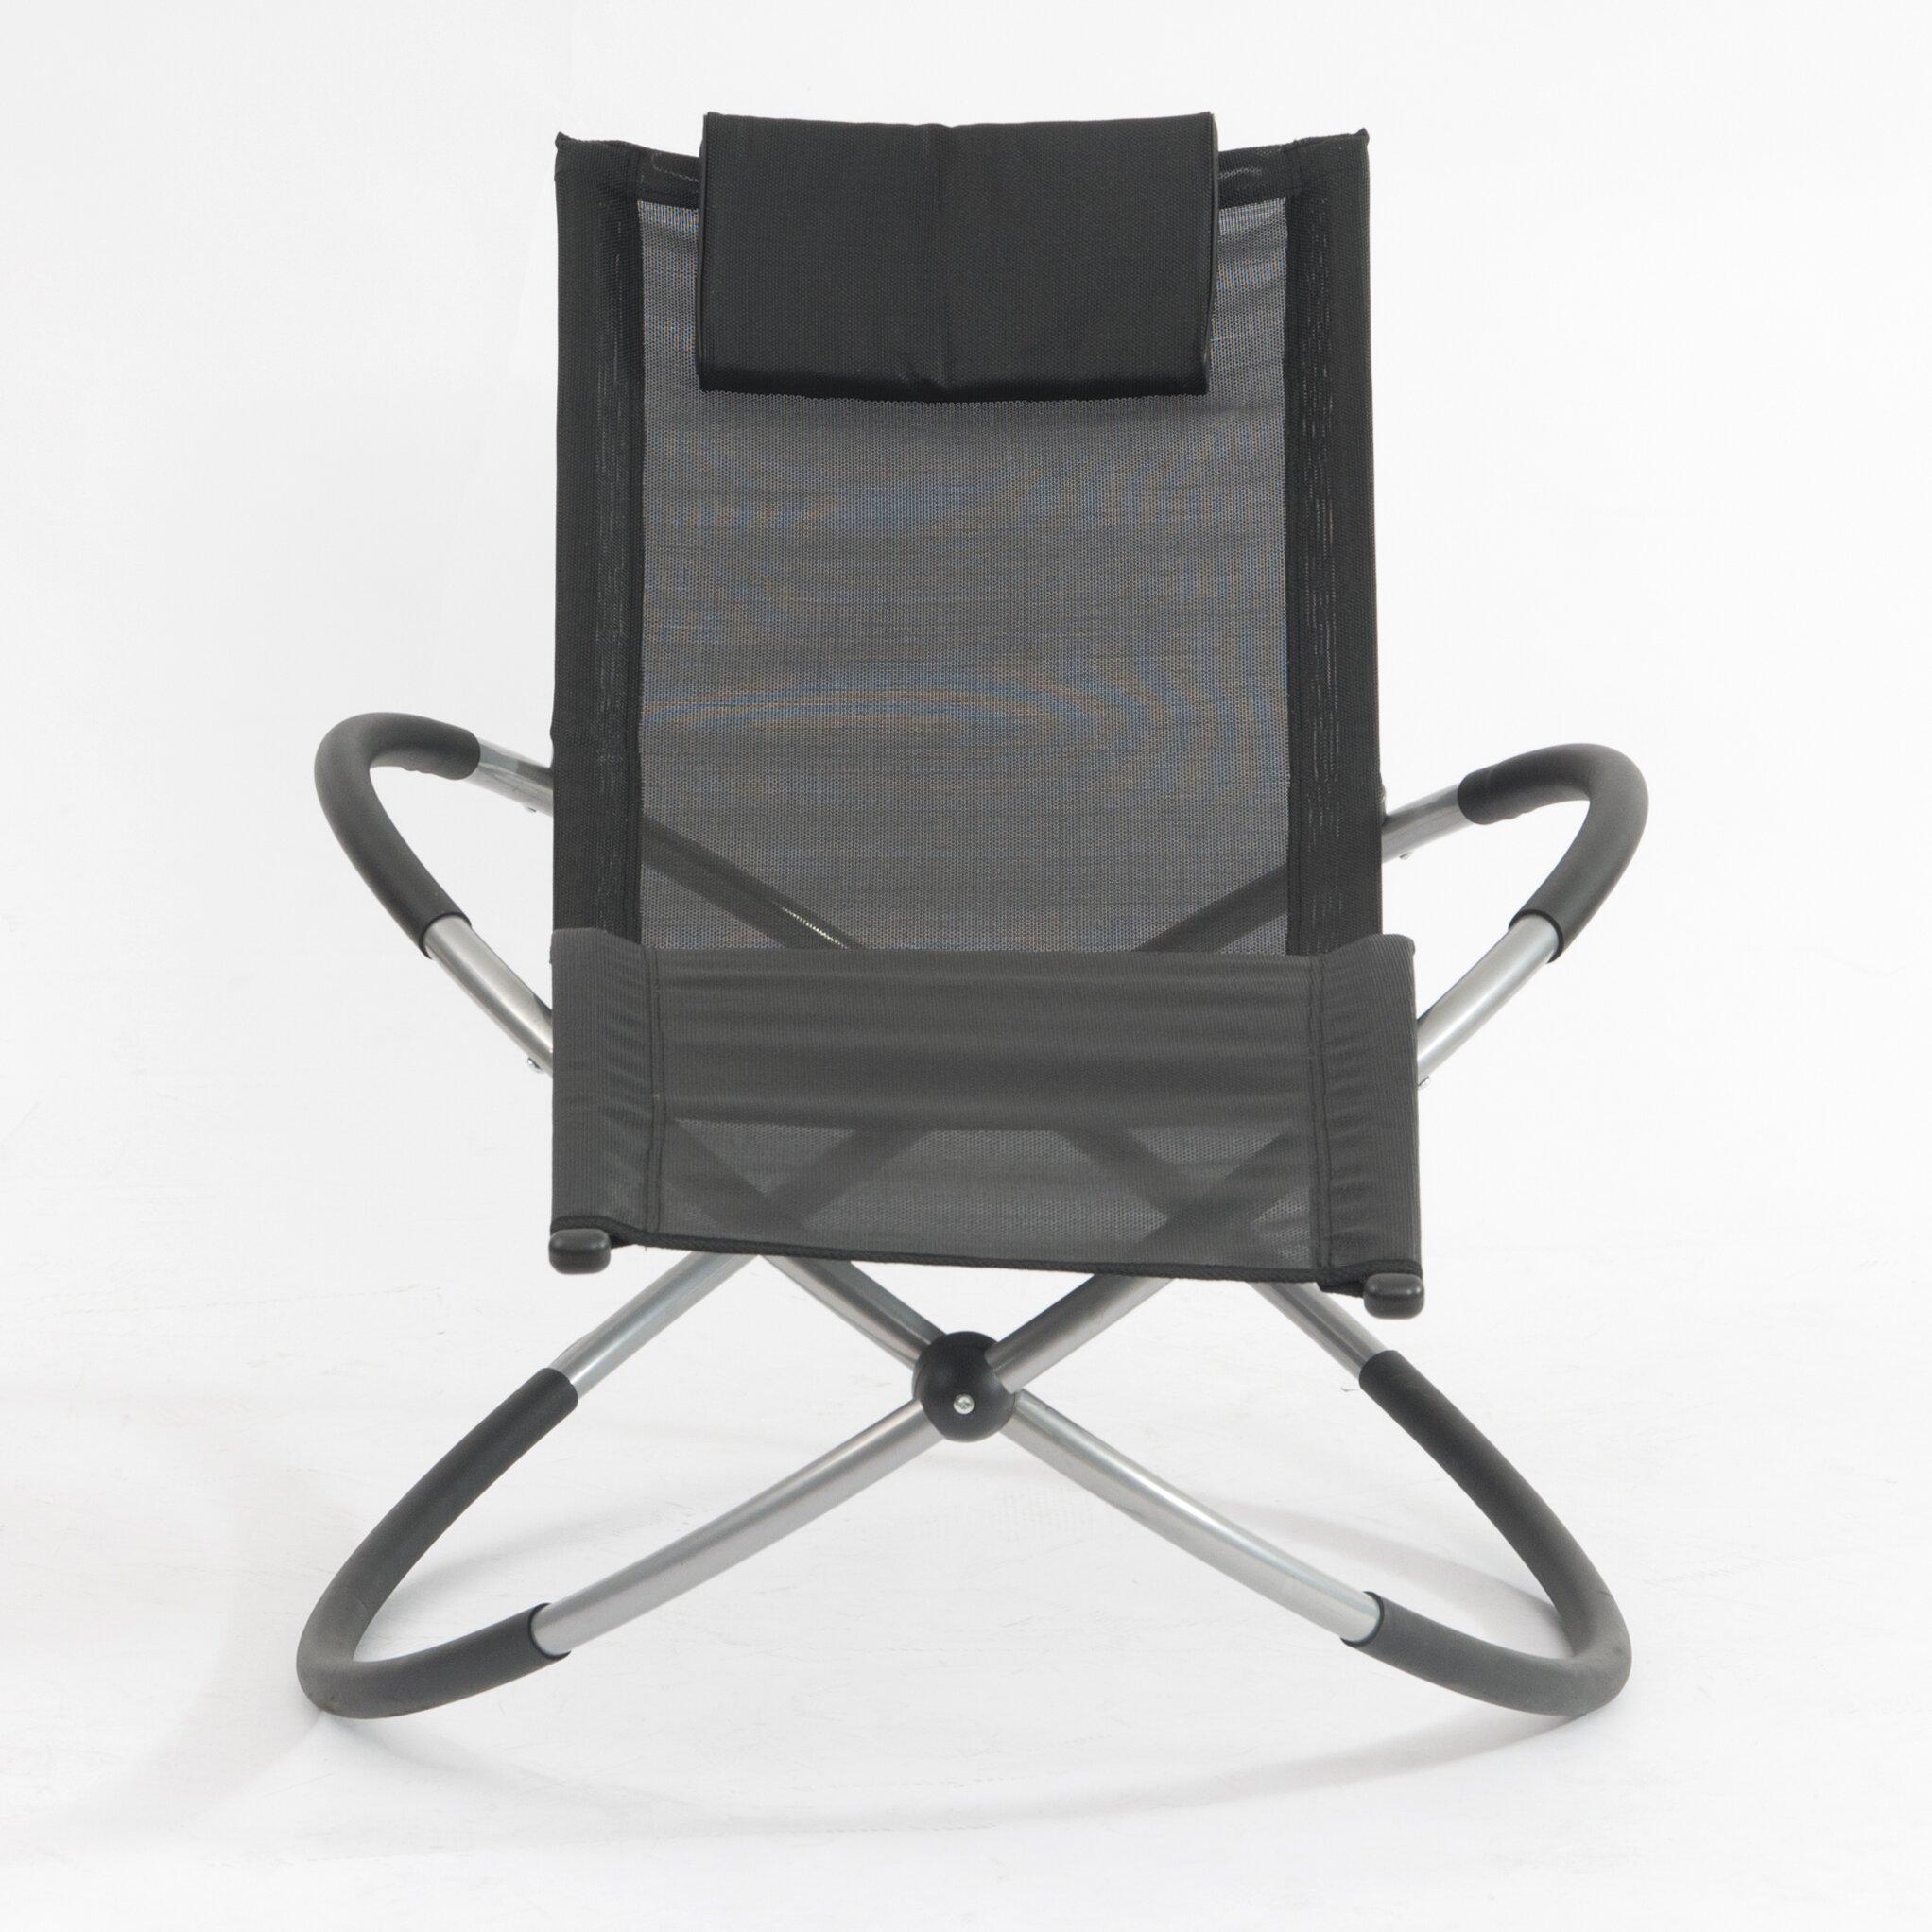 SunTime Outdoor Living Orbit Relaxer Chaise Lounge ... on Suntime Outdoor Living id=35540